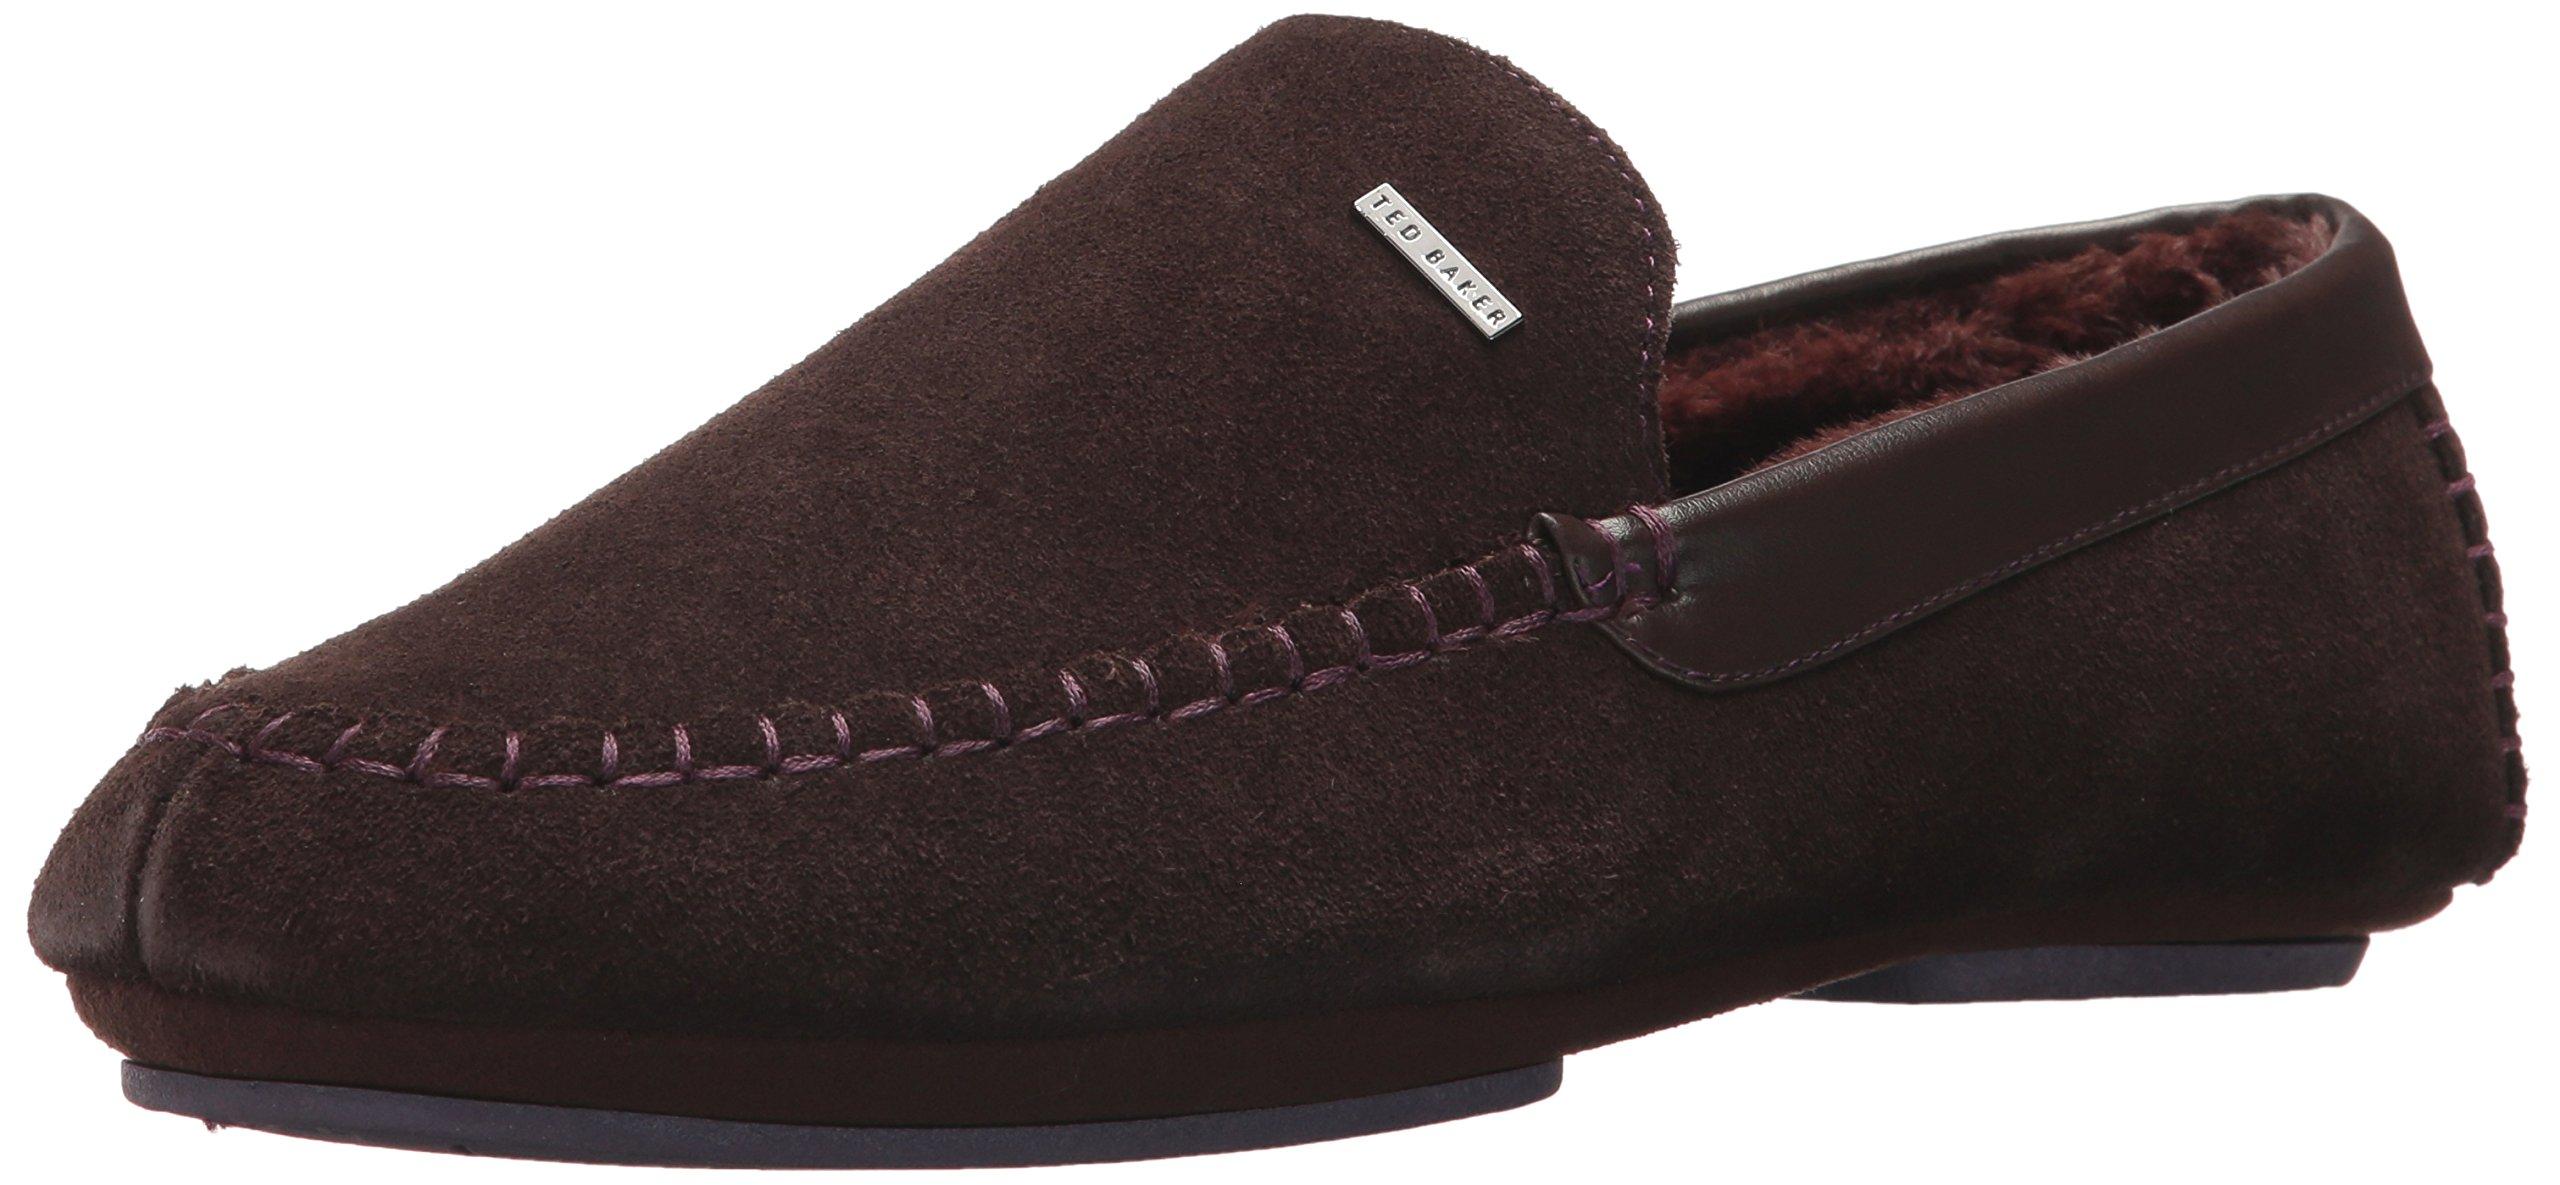 Ted Baker Men's Martt 2 Uniform Dress Shoe, Brown_216, 8 M US